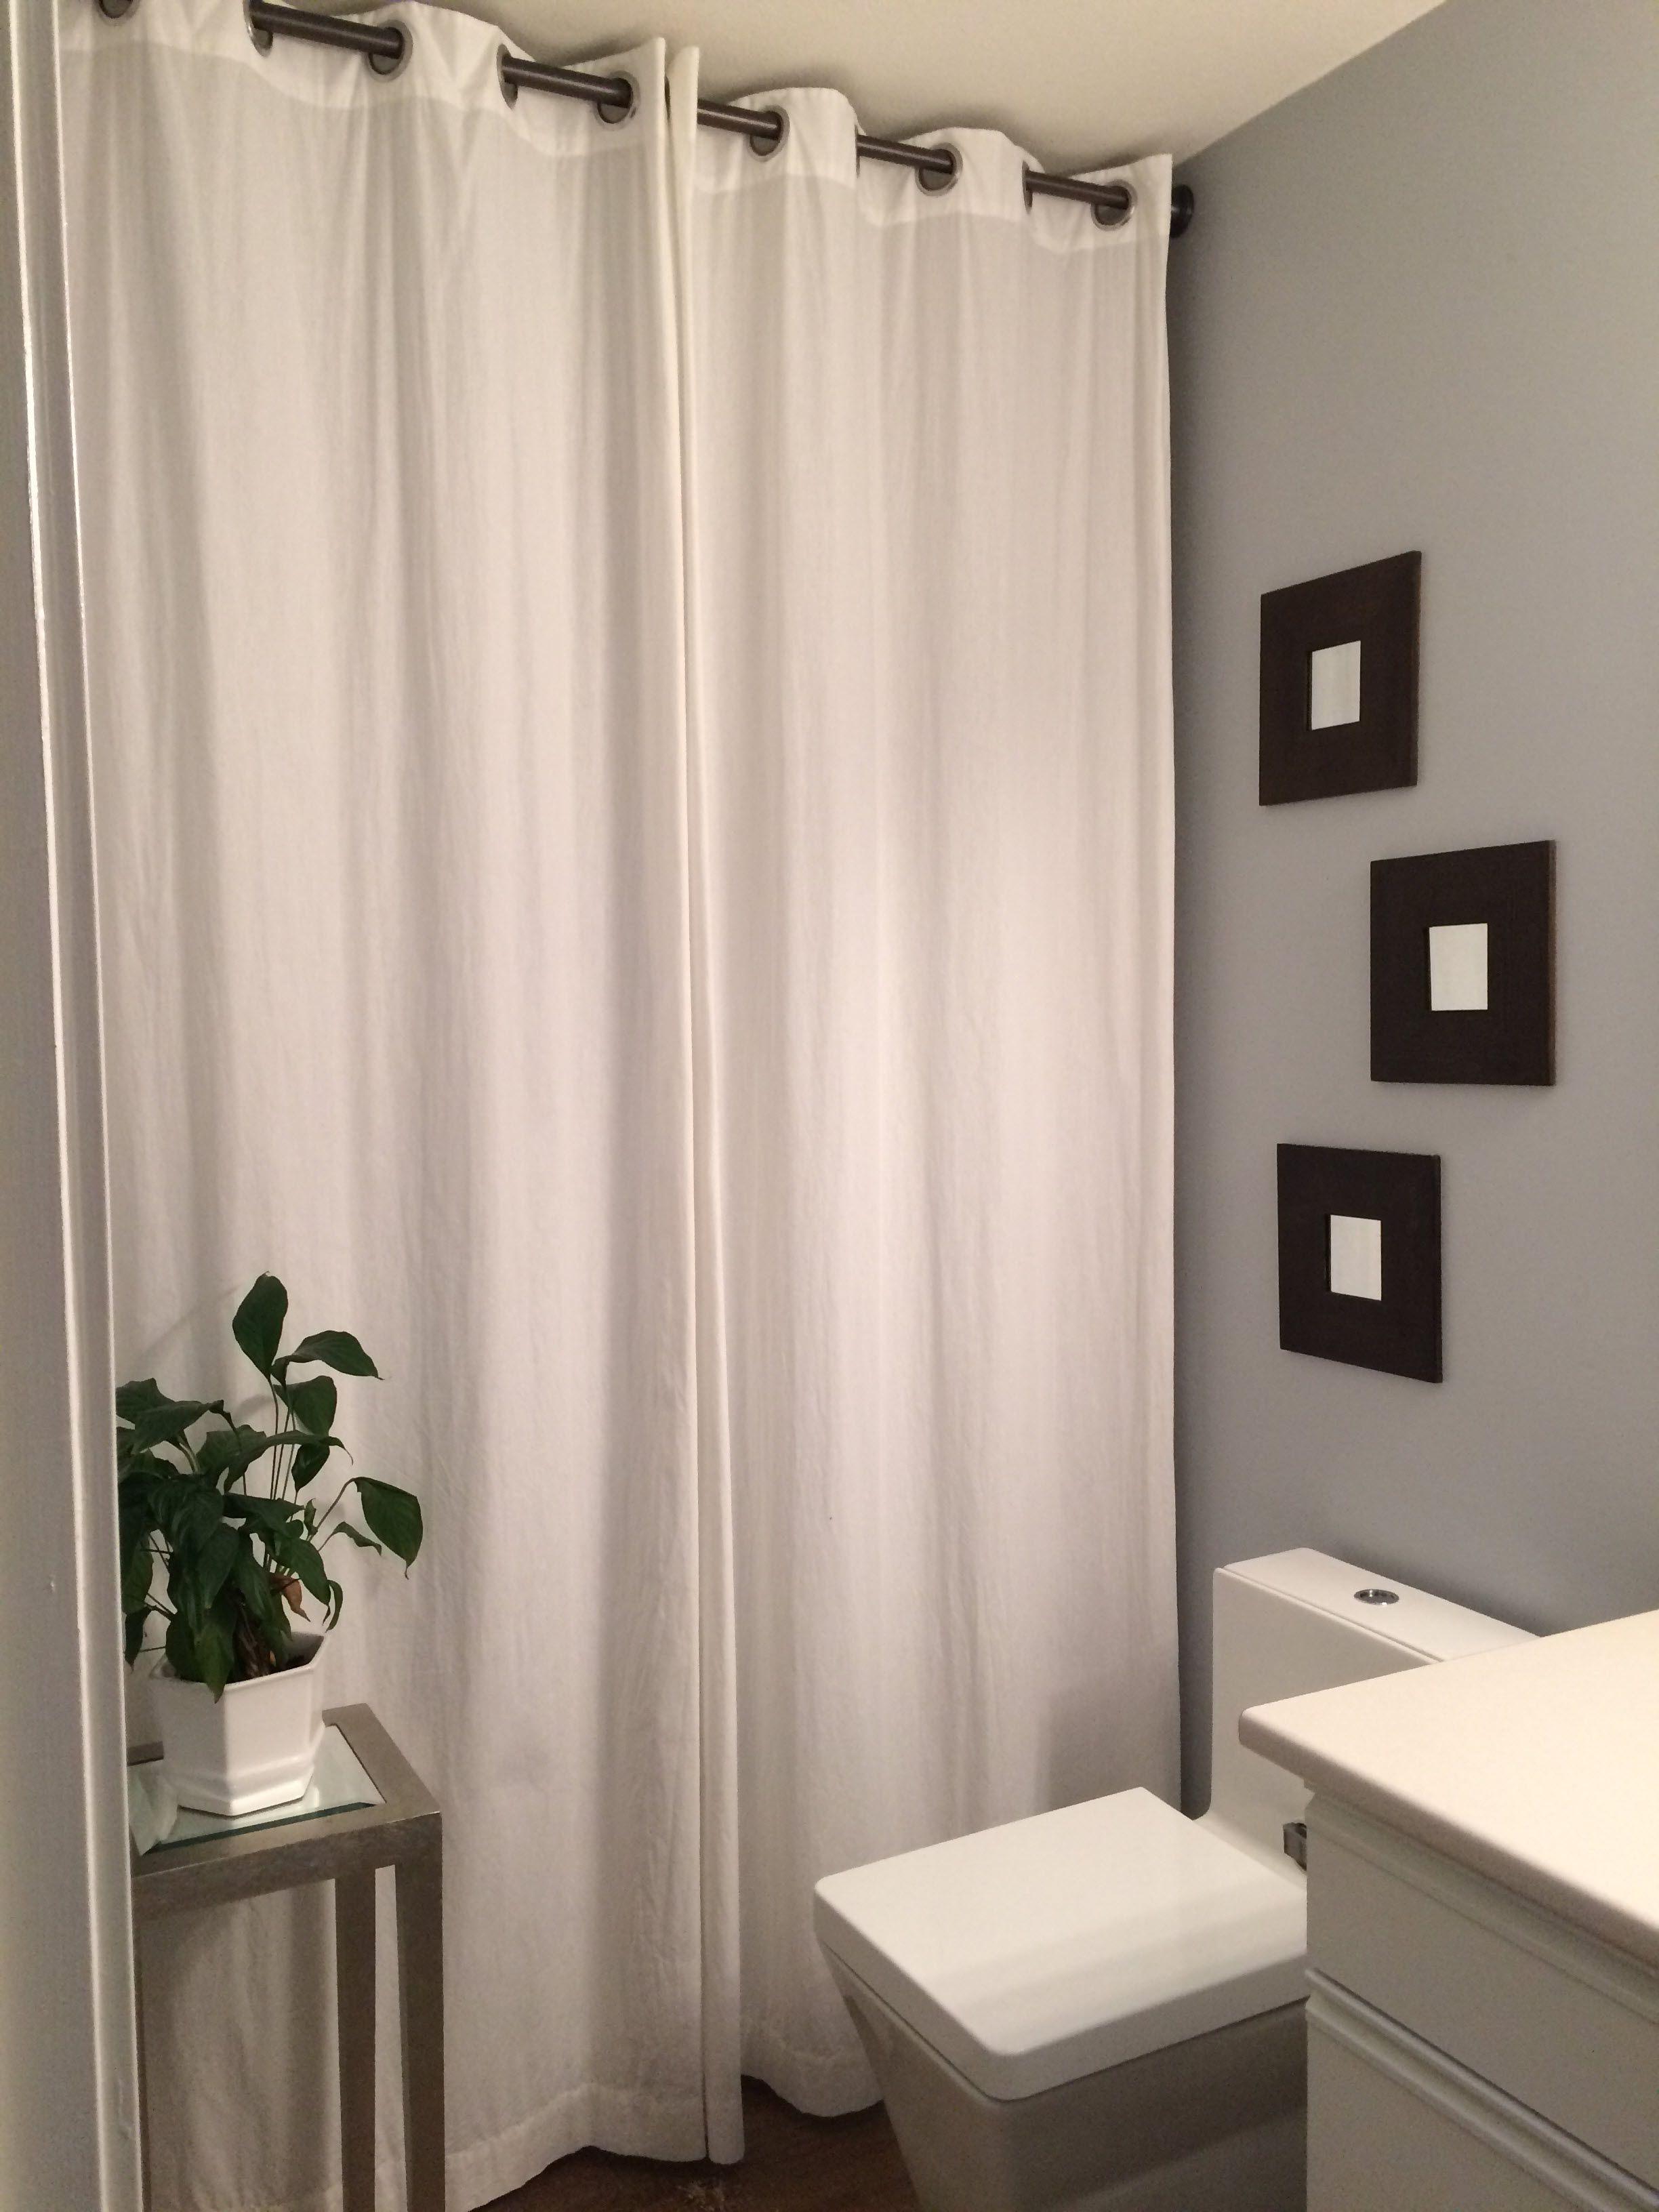 Bathroom Drapes Use A Full Height Drape In A Full Bathroom To